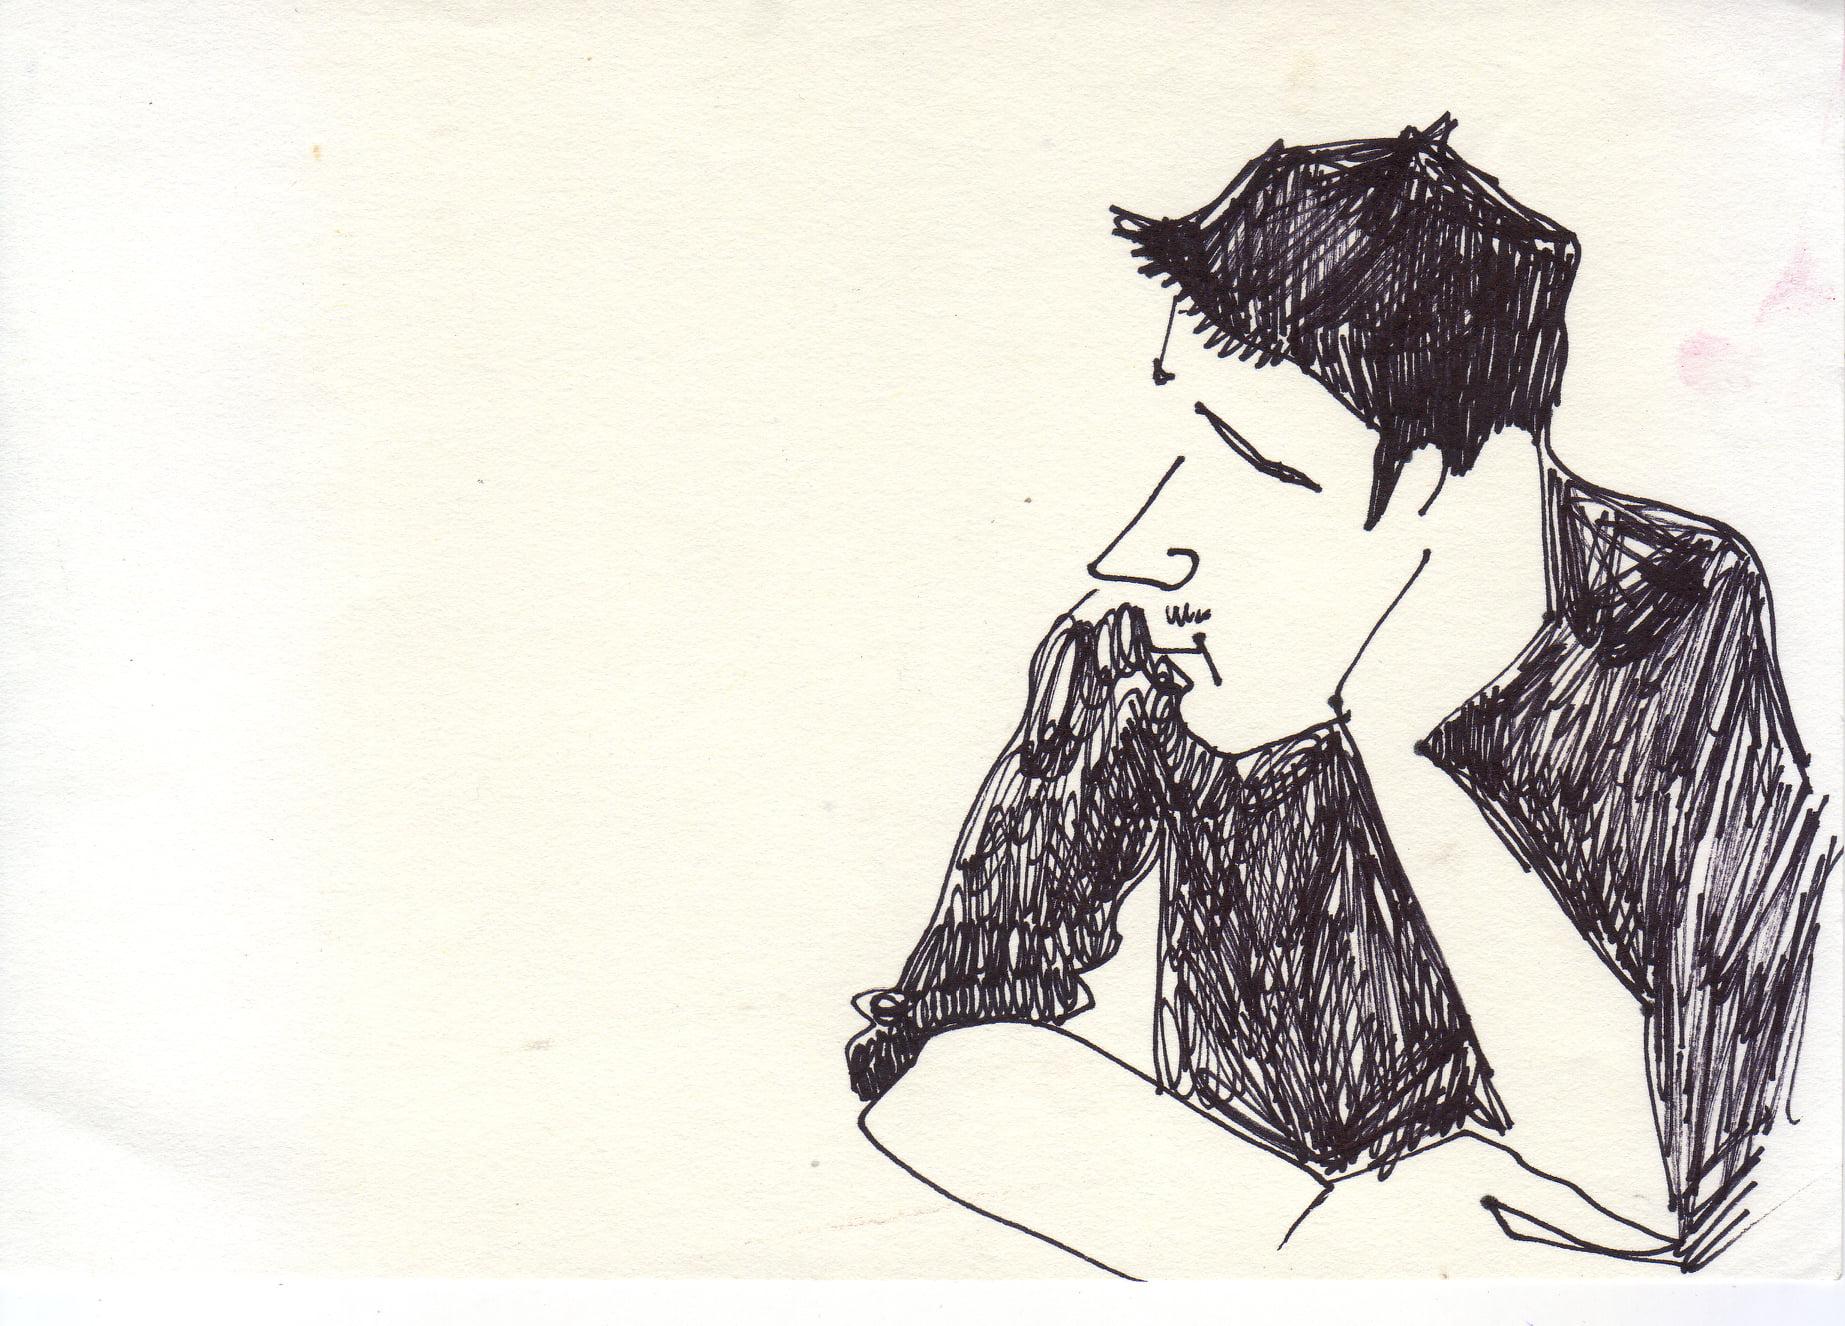 #lindarandazzo Vito Stassi penna su carta